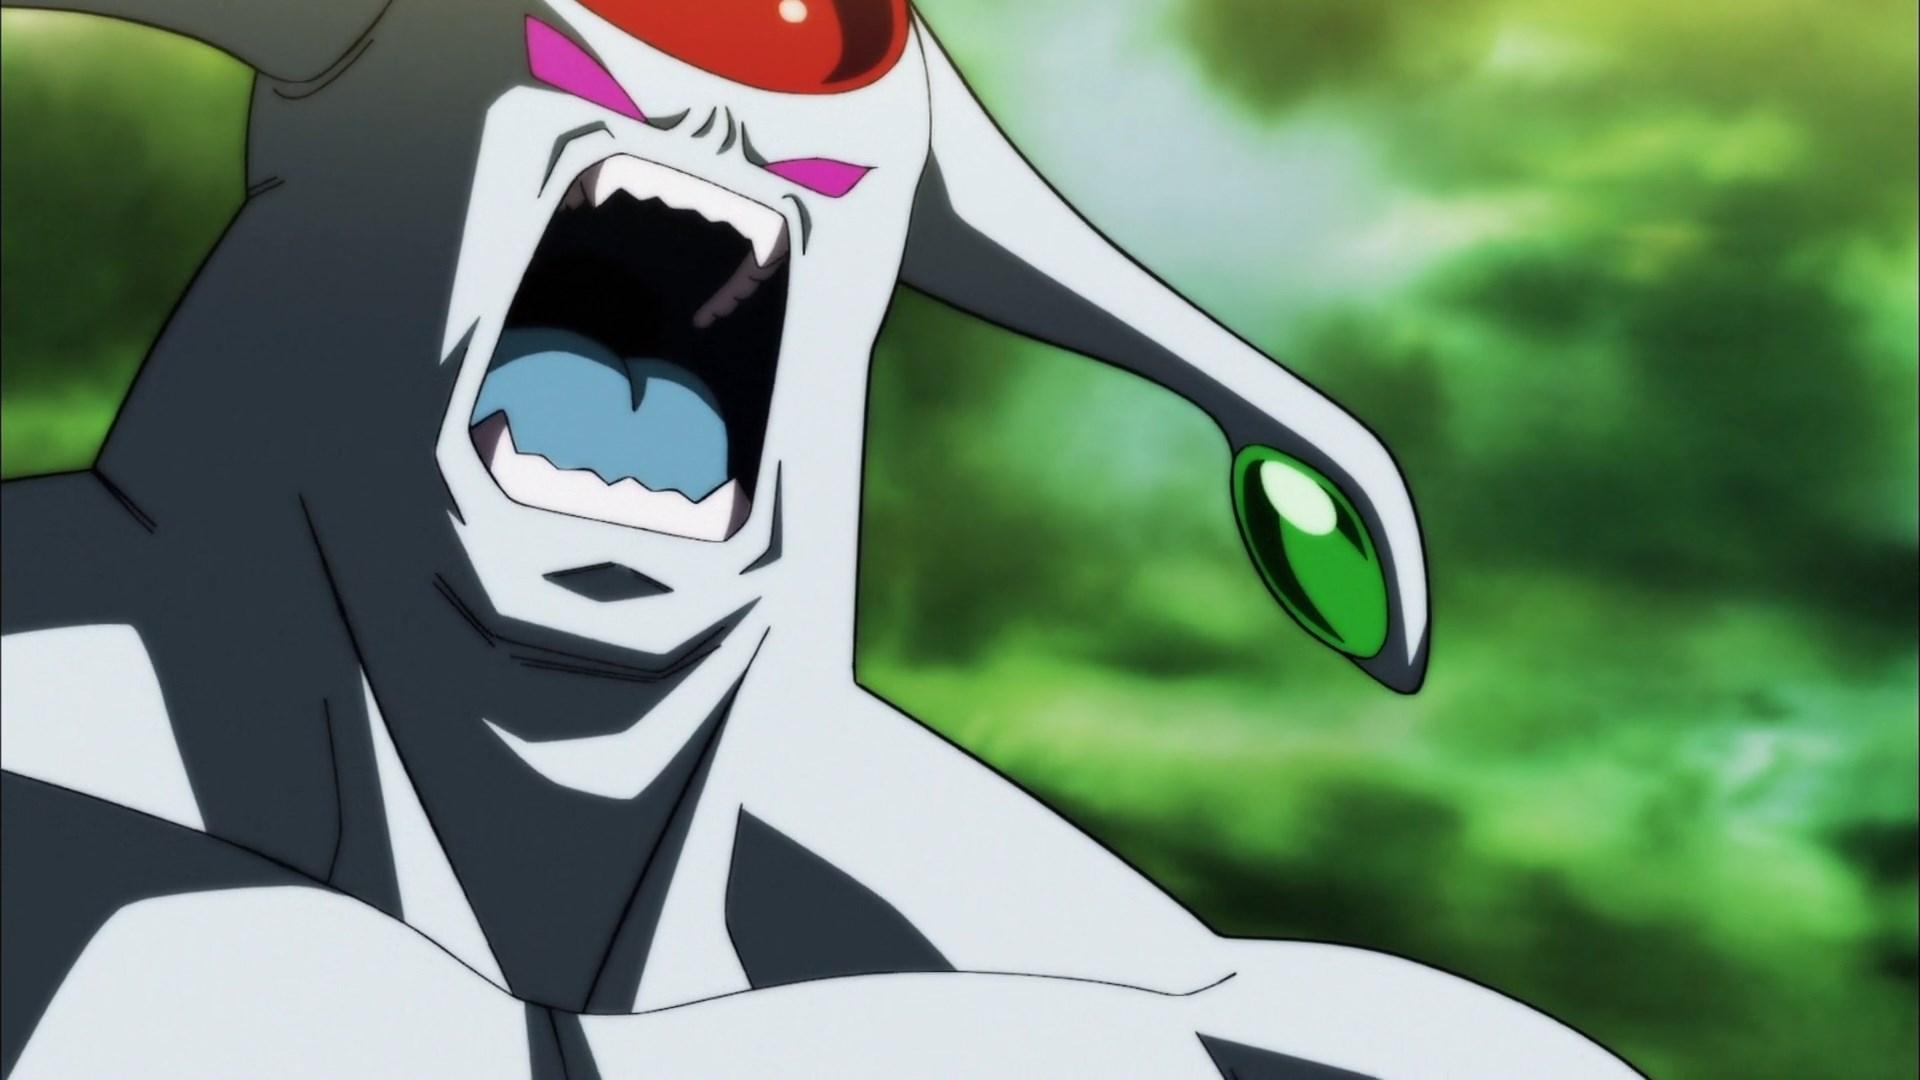 [HorribleSubs] Dragon Ball Super - 121 [1080p].mkv_snapshot_08.10